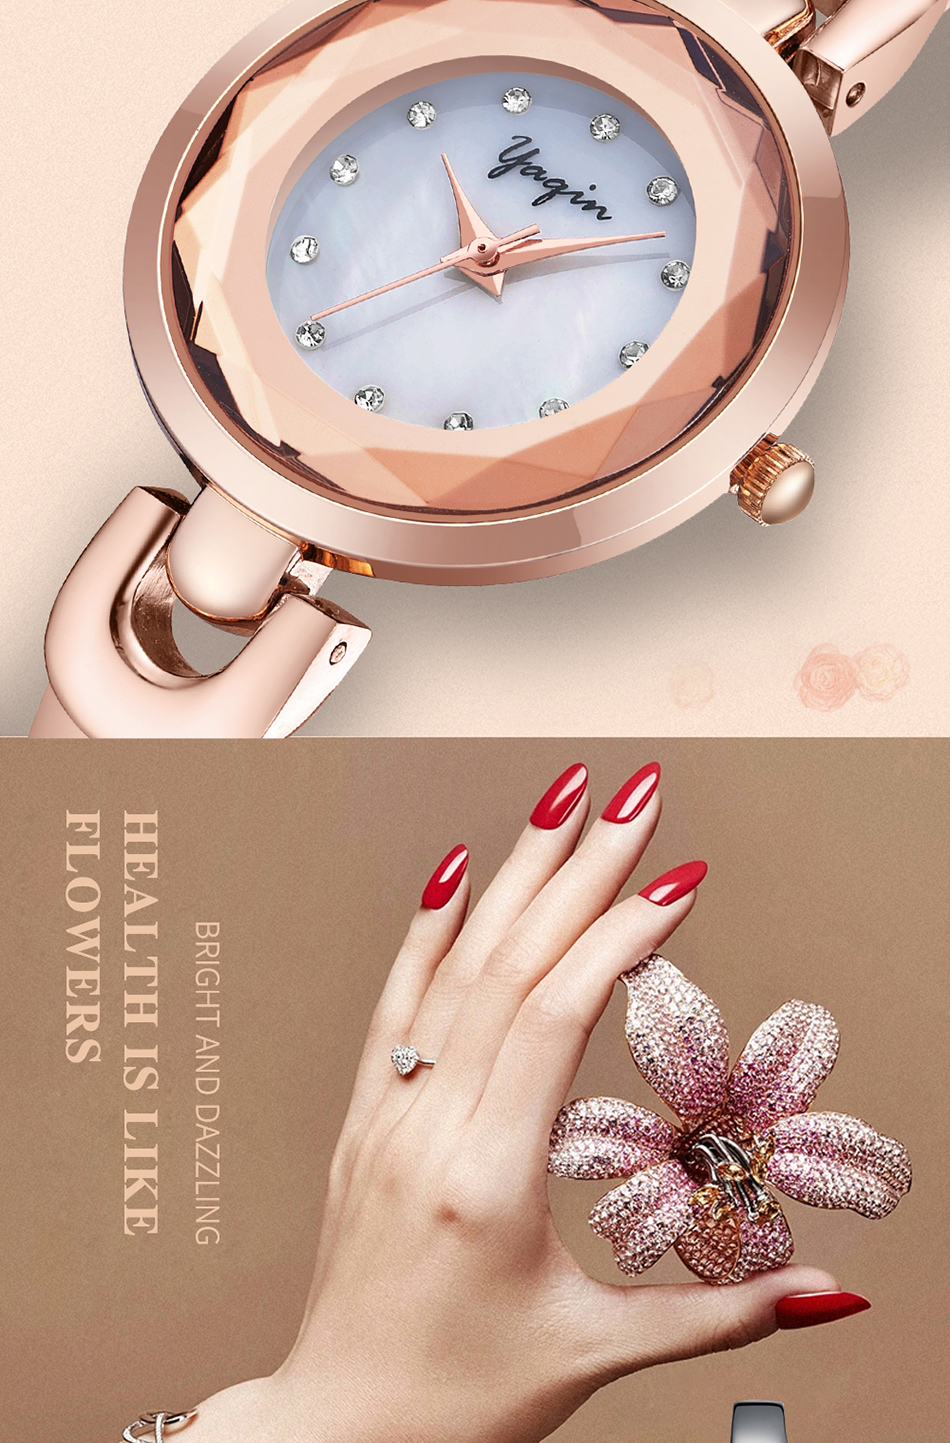 Nieuwe mode vrouwen quartz horloges casual jurk meisjes horloges - Dameshorloges - Foto 4